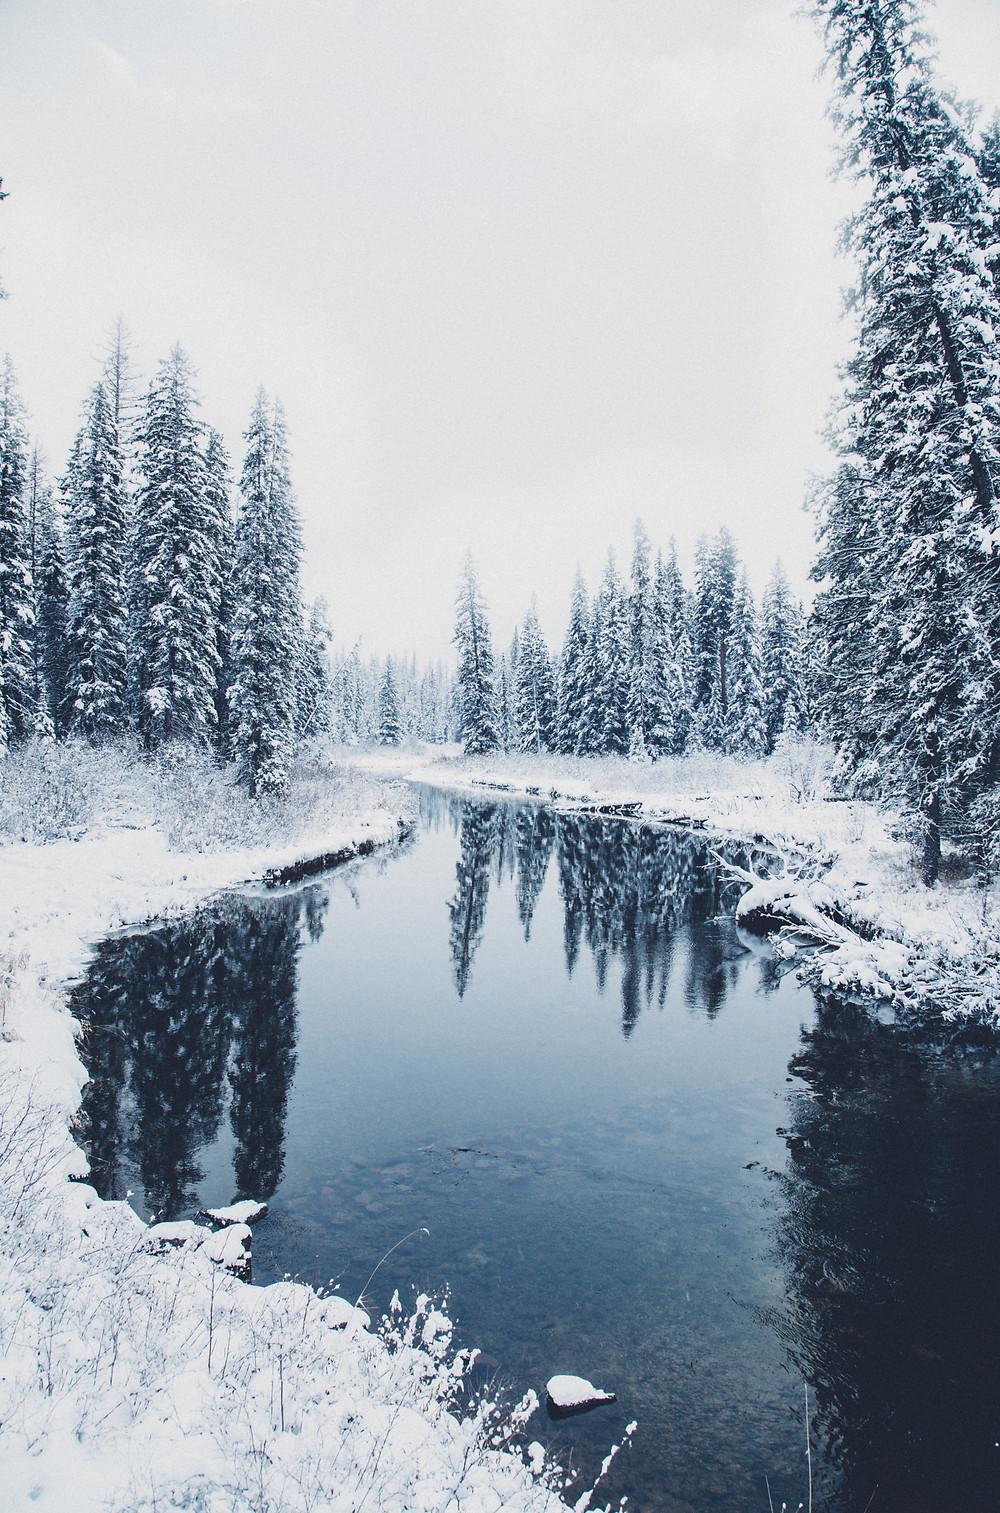 Swan River Winter, Montana |  Montana Adventure Photographer | Montana Photographer